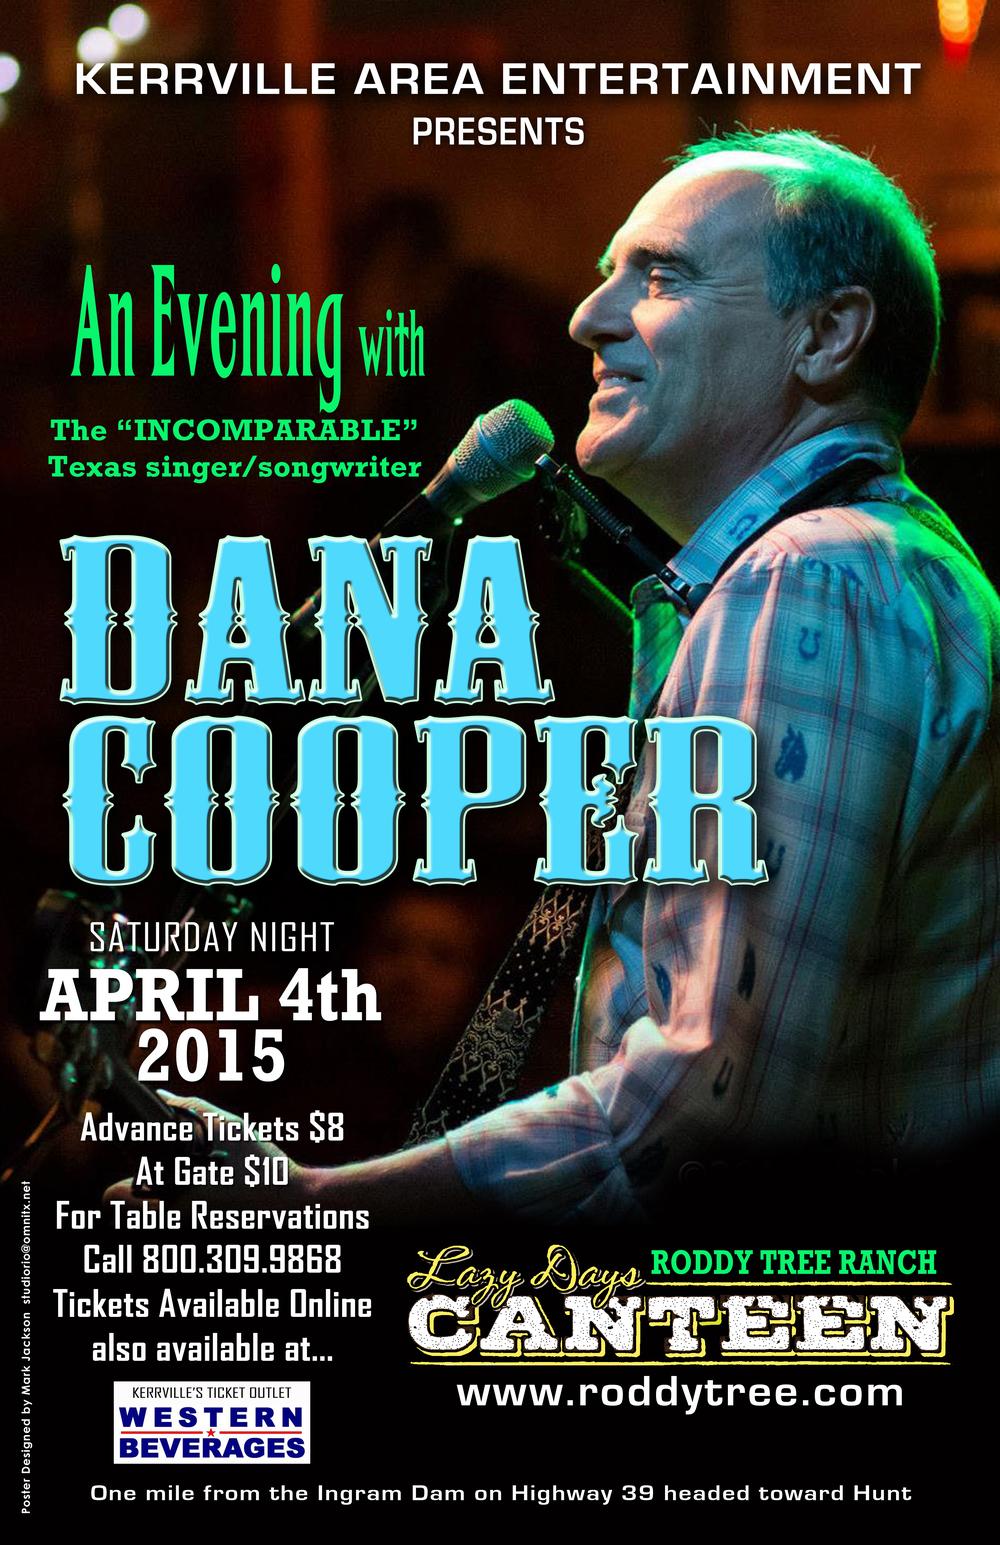 Dana Cooper poster 2015.jpg